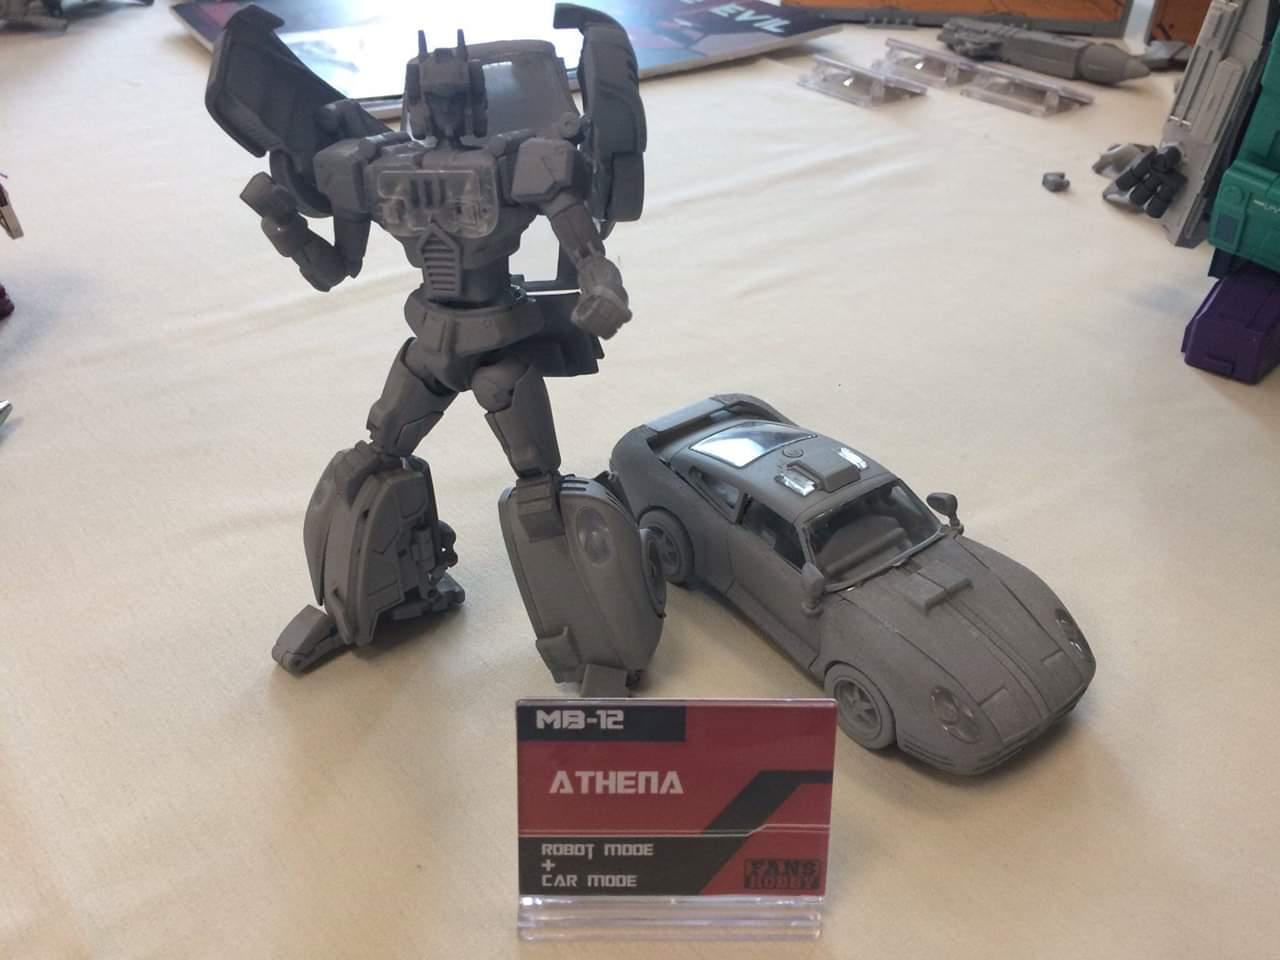 [FansHobby] Produit Tiers - MB-12 Athena (aka Minerva|Nightbeat/Veilleur) et MB-13 Ace Hitter (aka Goshooter|Siren/Sirène) [TF Masterforce] MFuWJ8UN_o